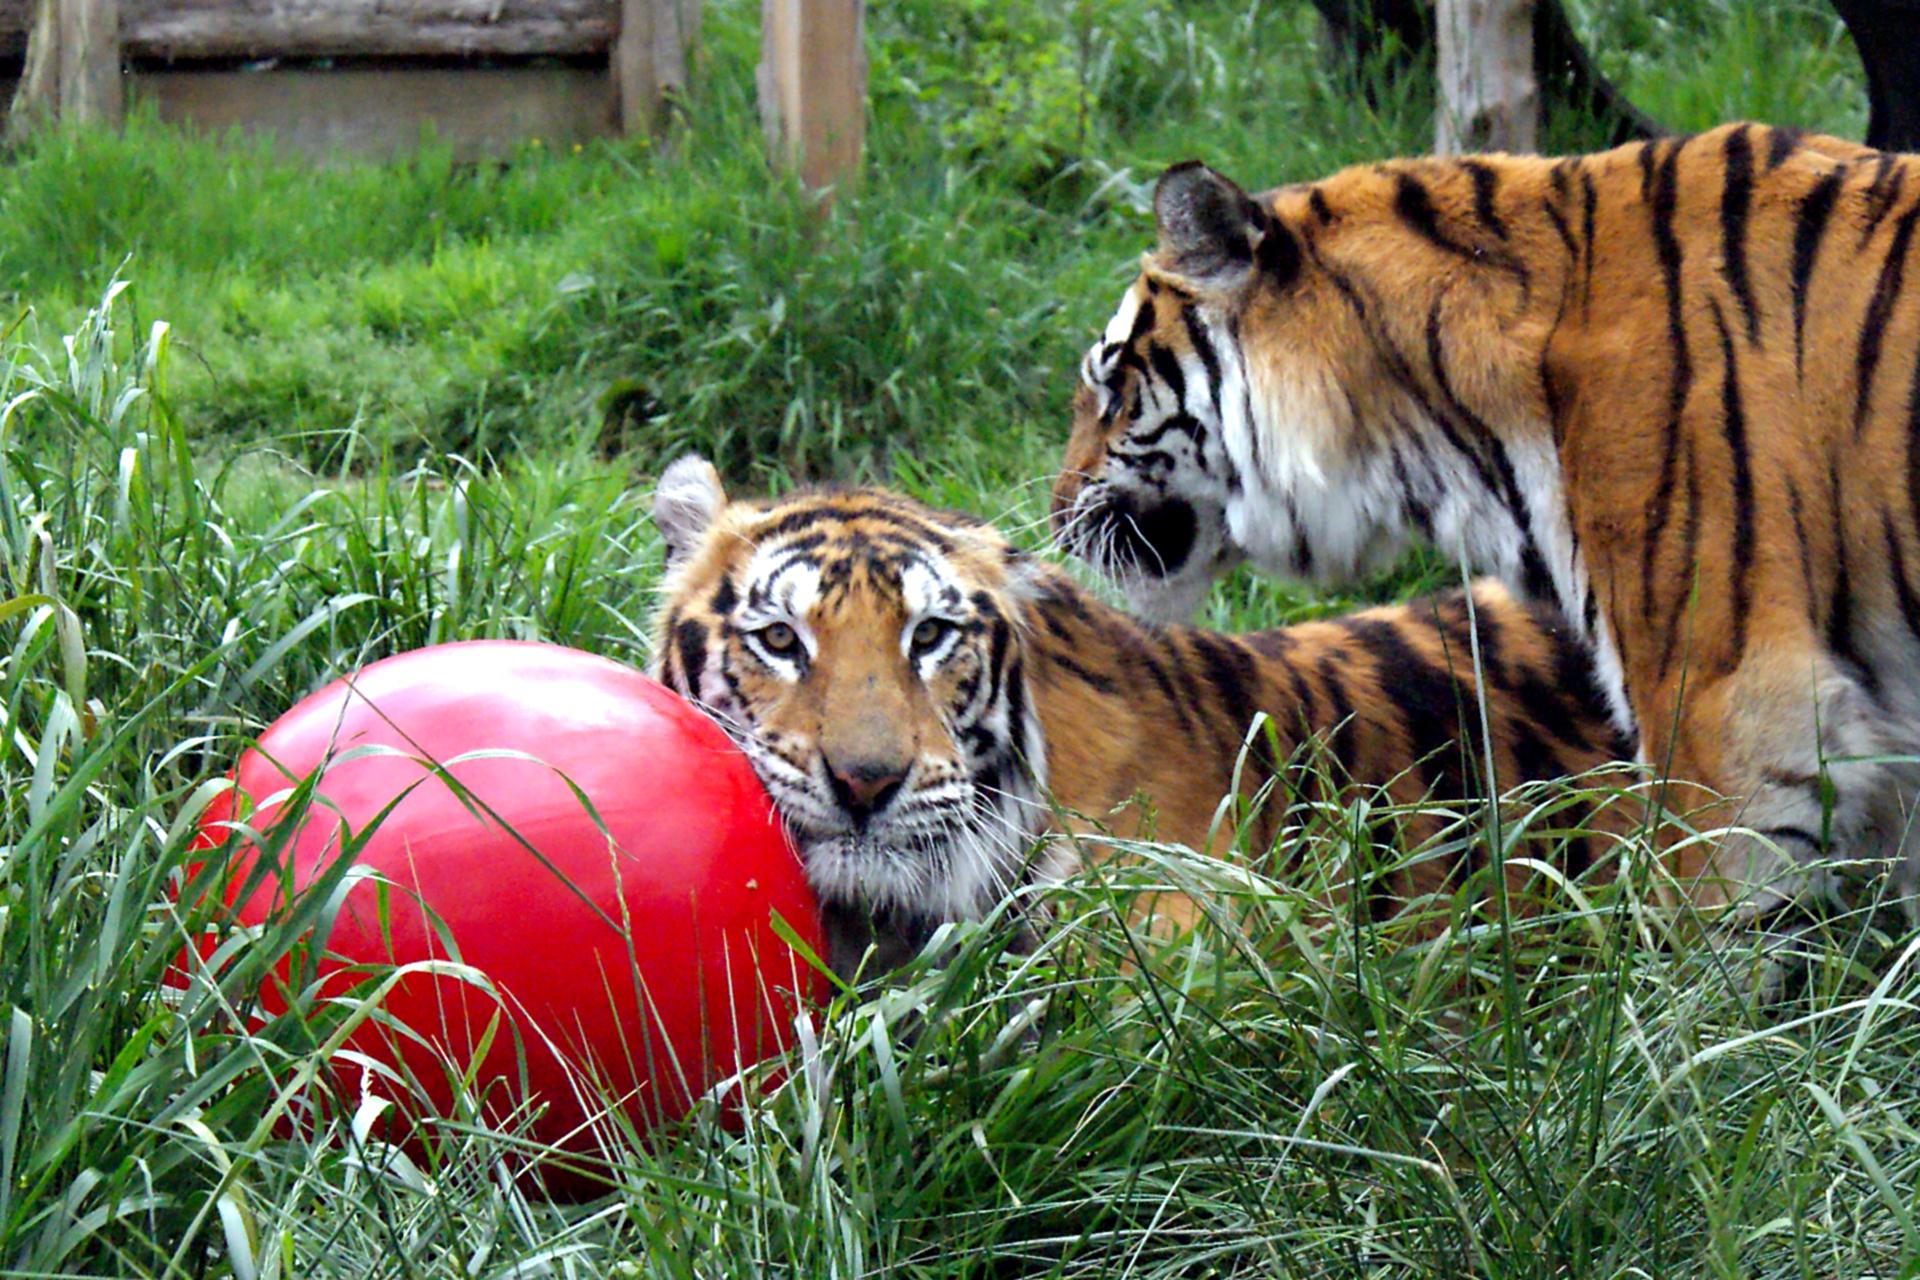 Christian Tiger Carolina Tiger Rescue